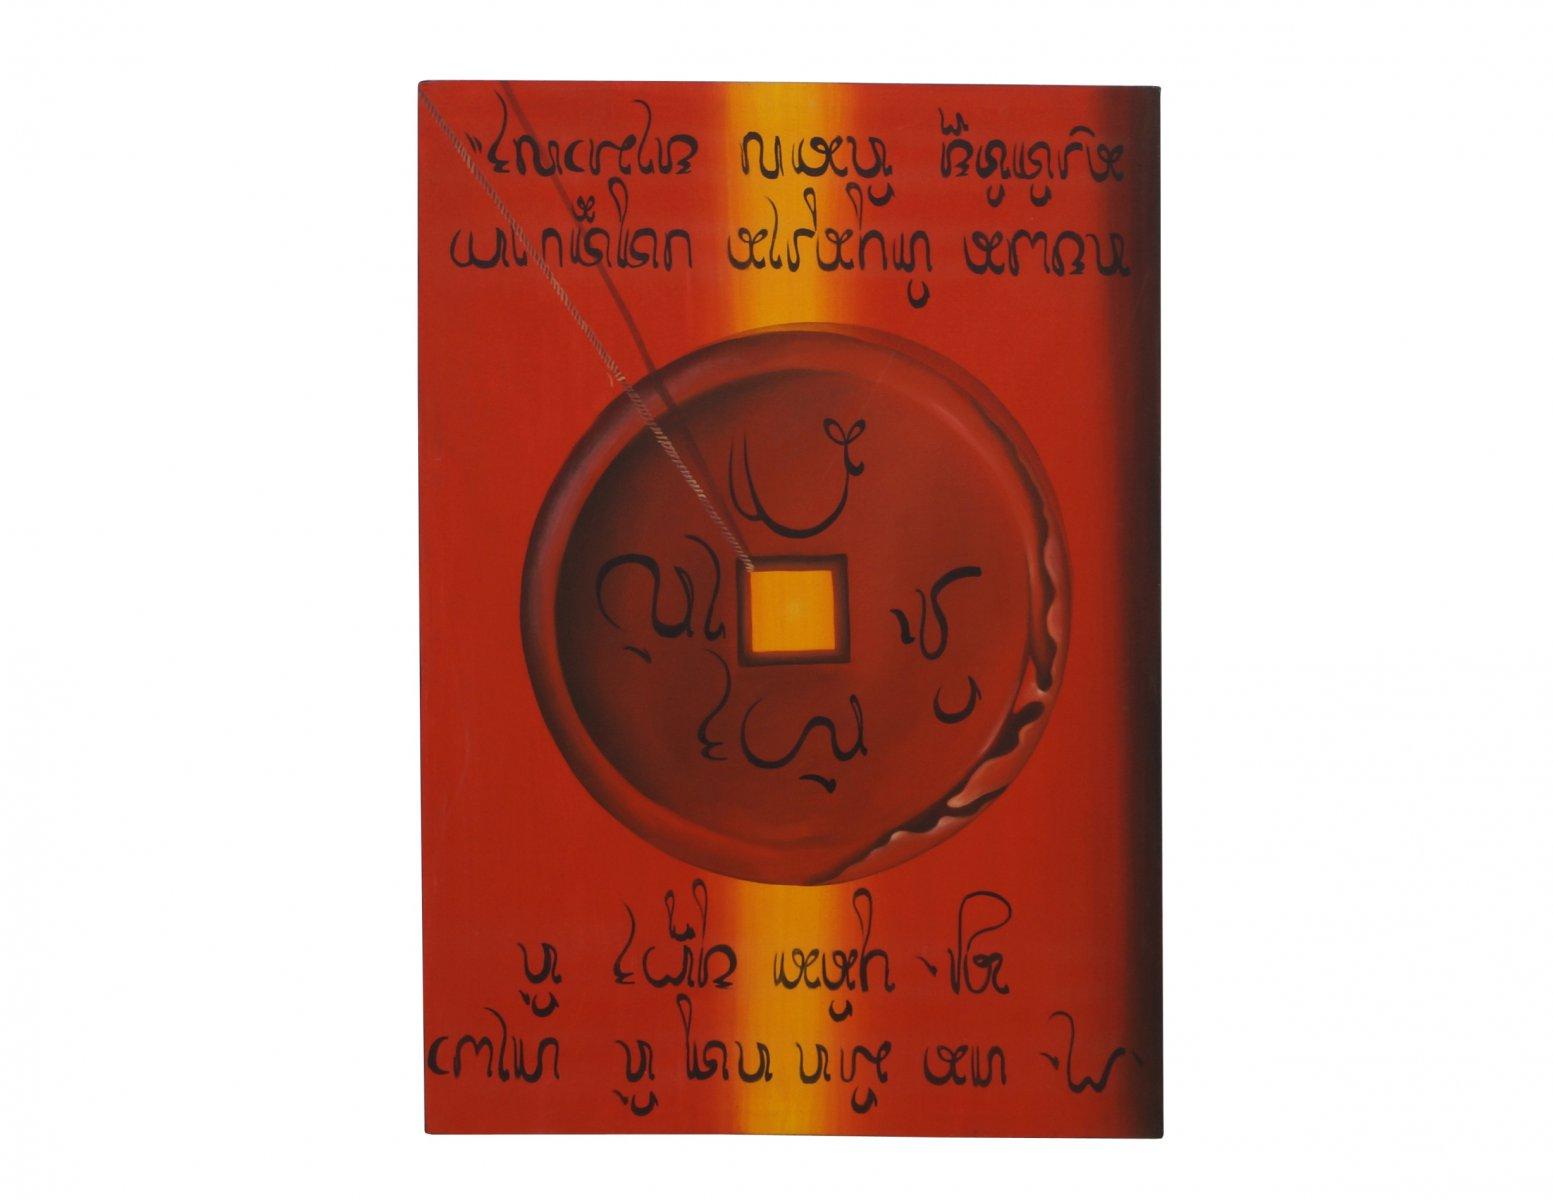 Obraz na plotnie indyjskie znaki